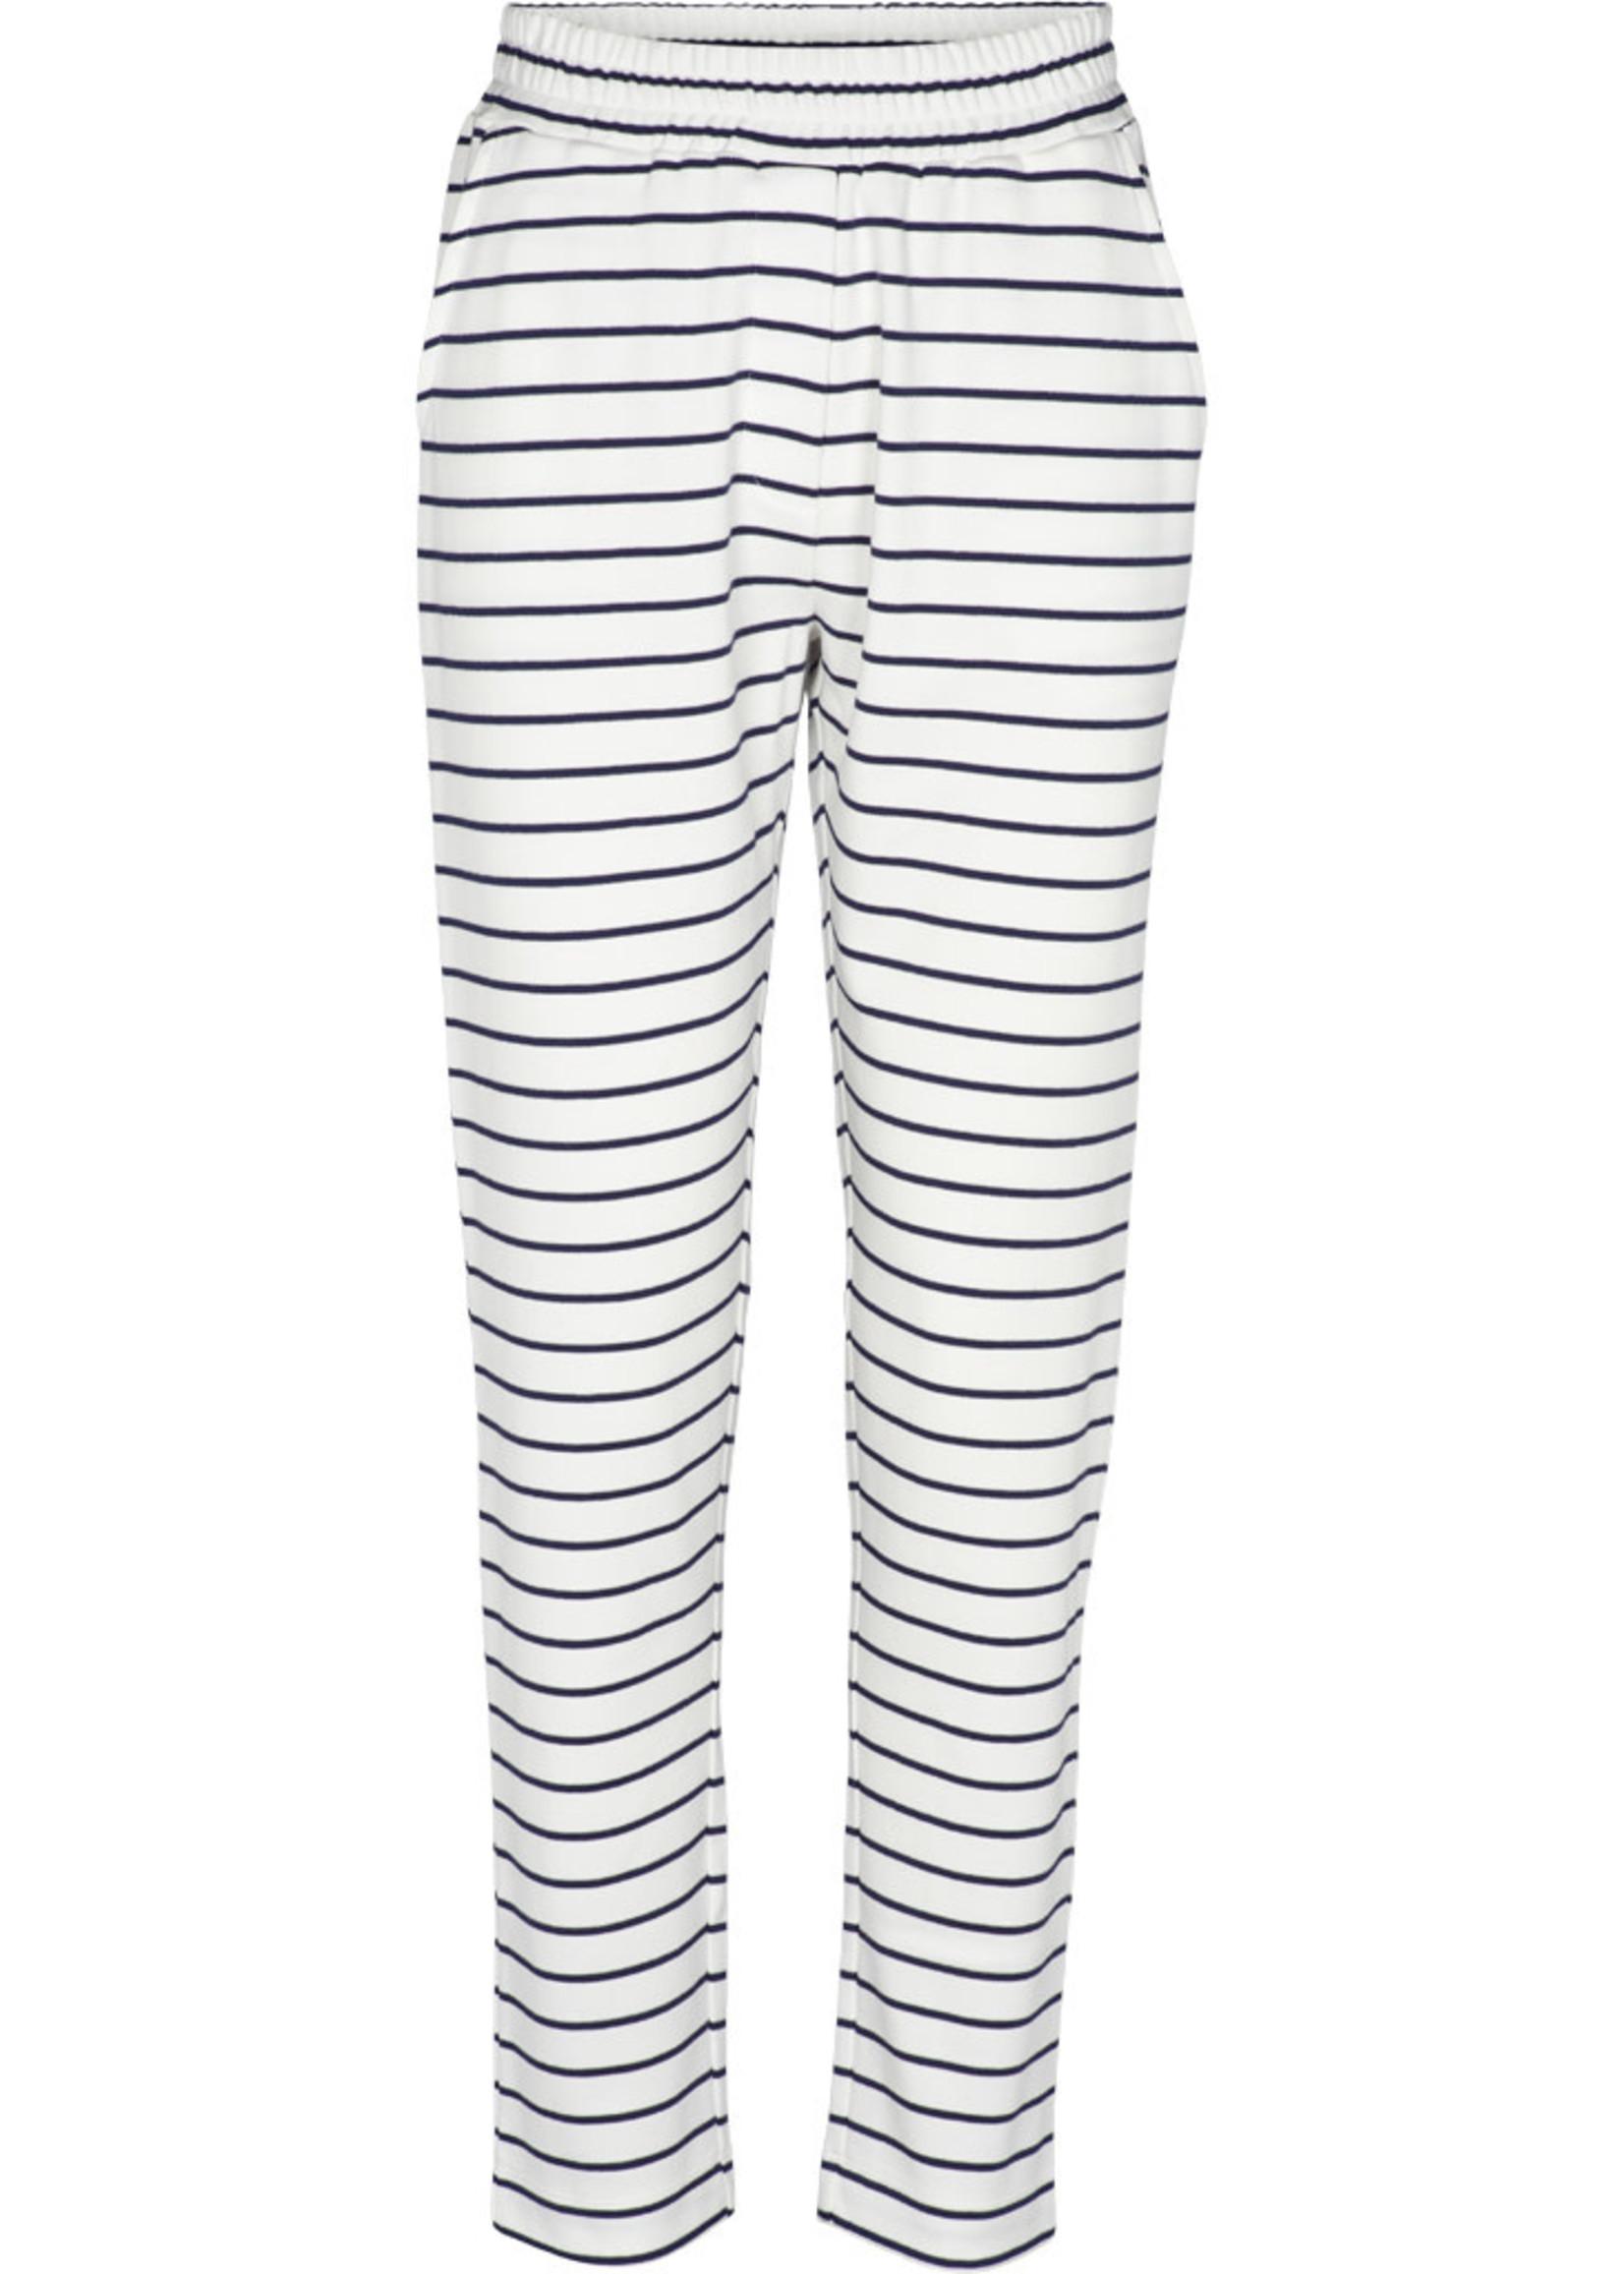 Basic Apparel Saga Striped Pants